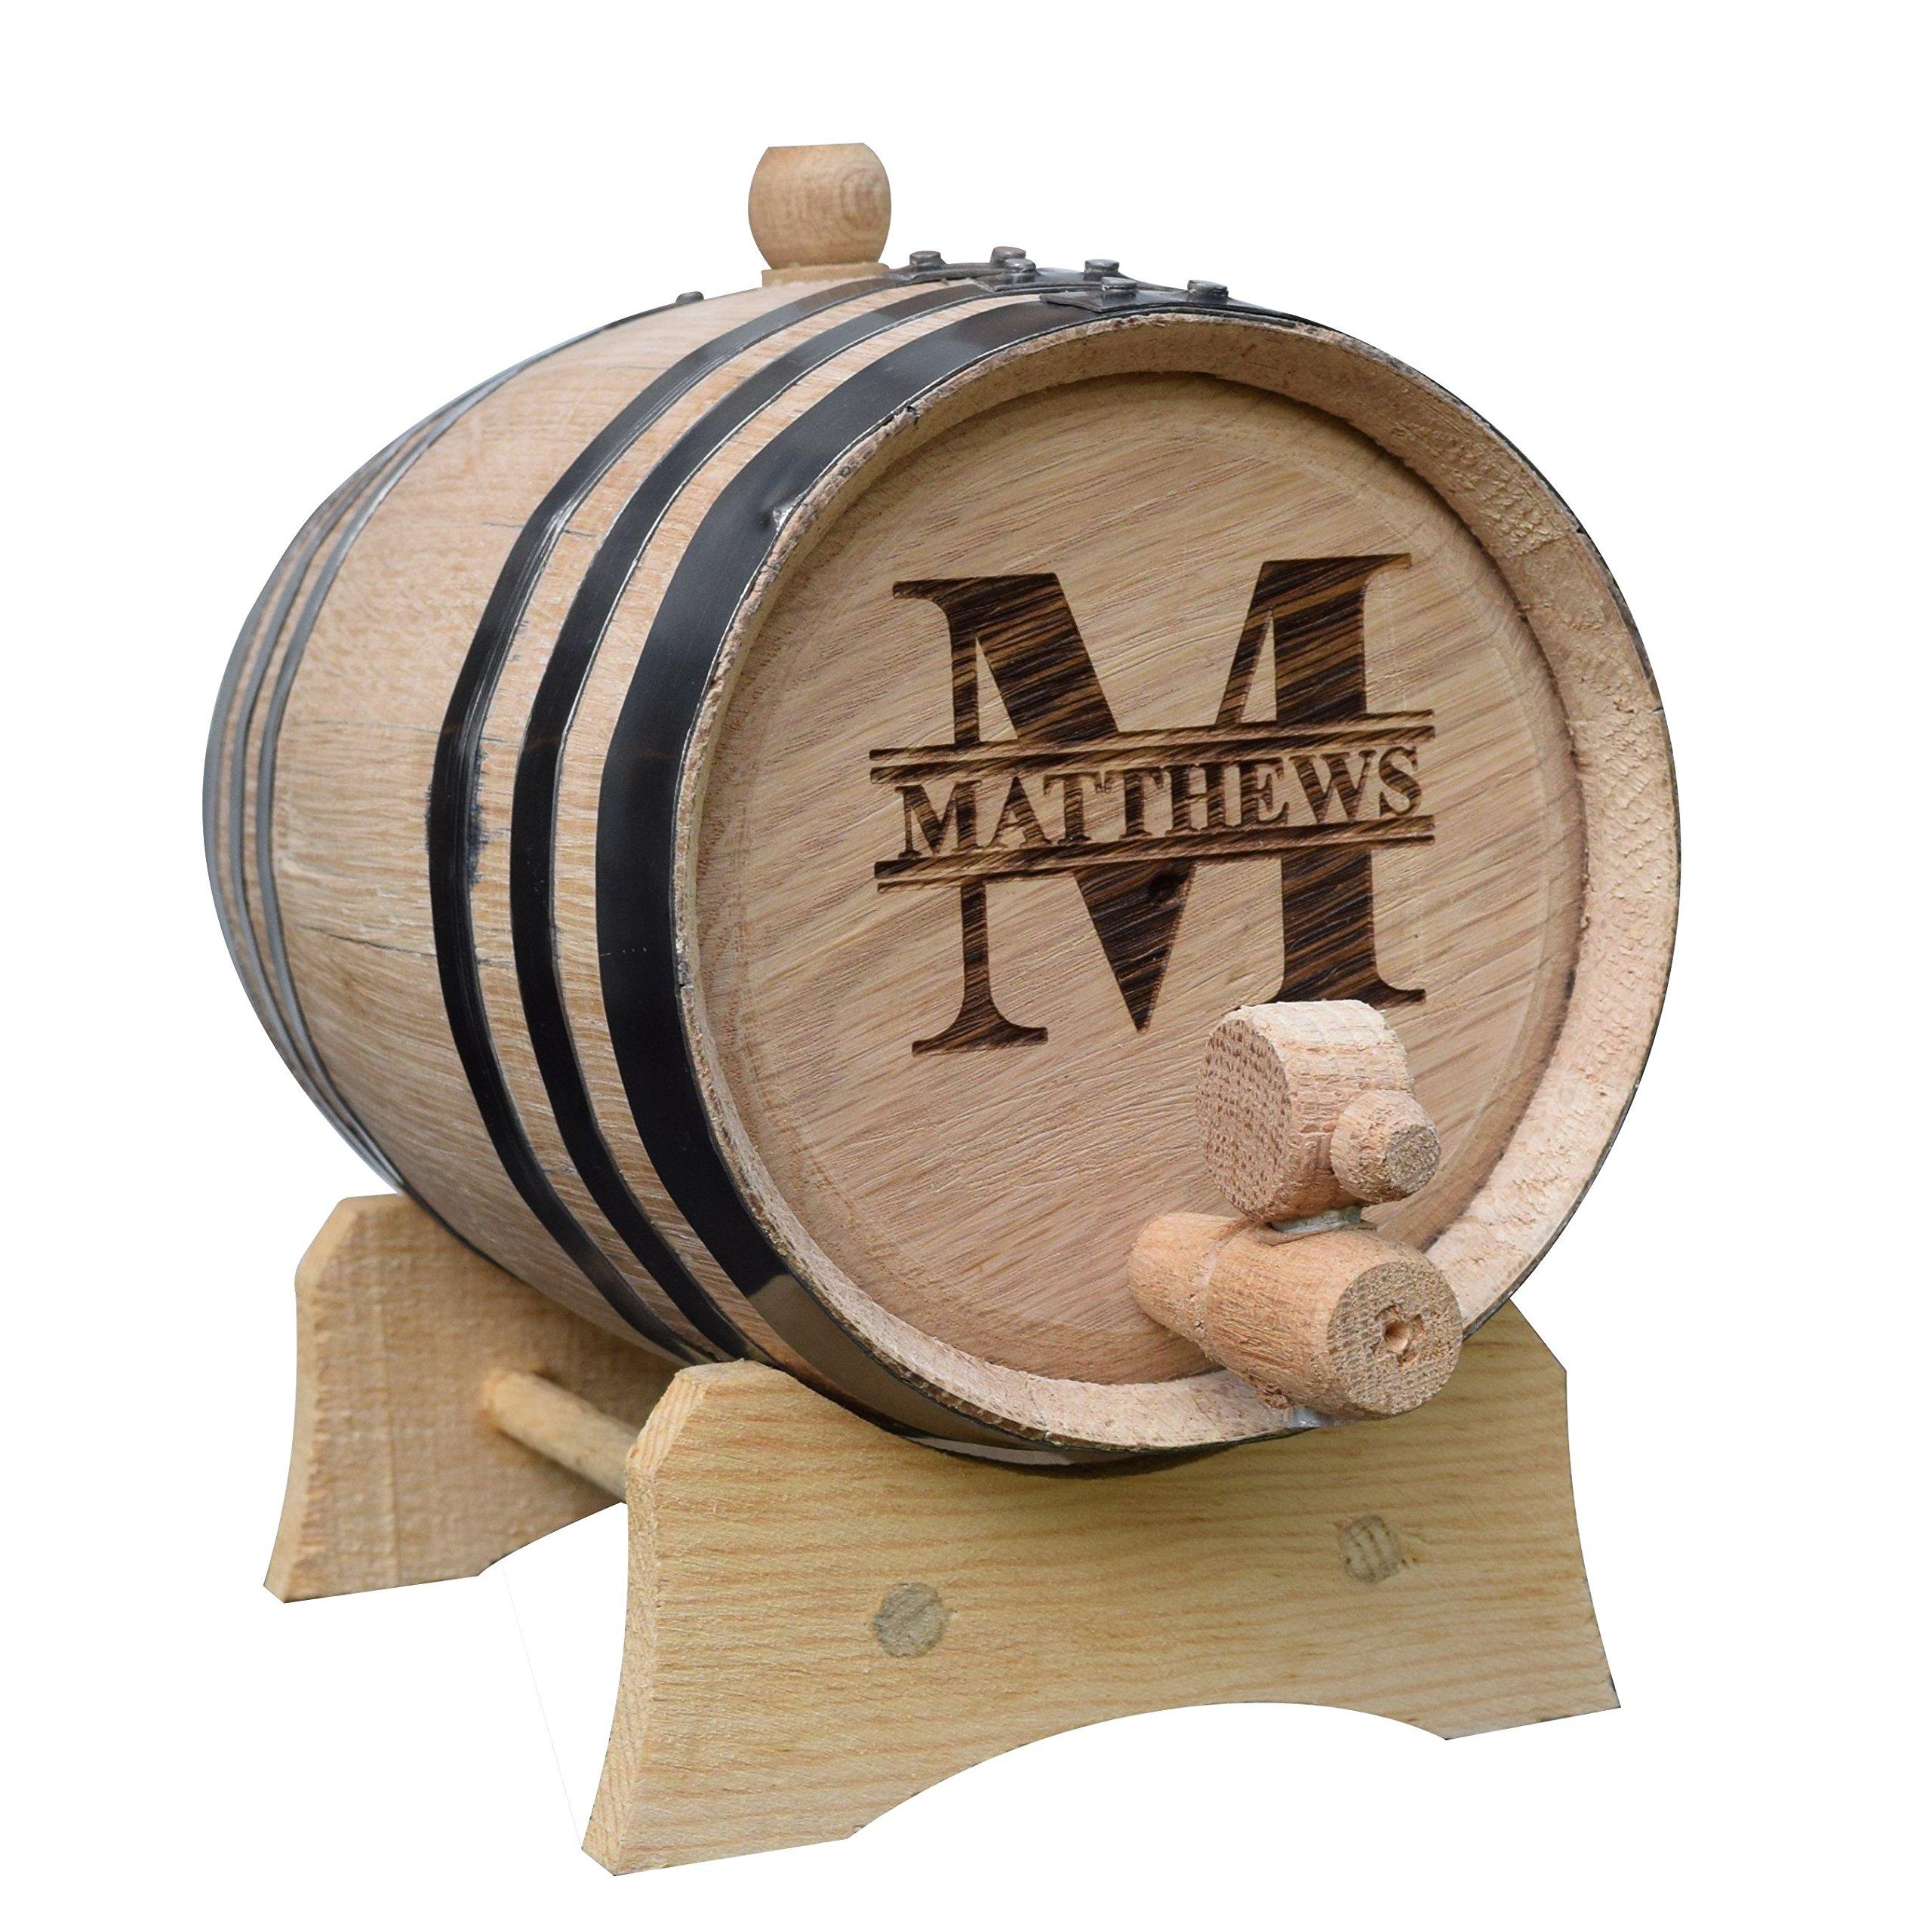 Custom Mini Whiskey Barrel - Personalized Wine Barrel - Engraved Oak 1 Liter Barrel